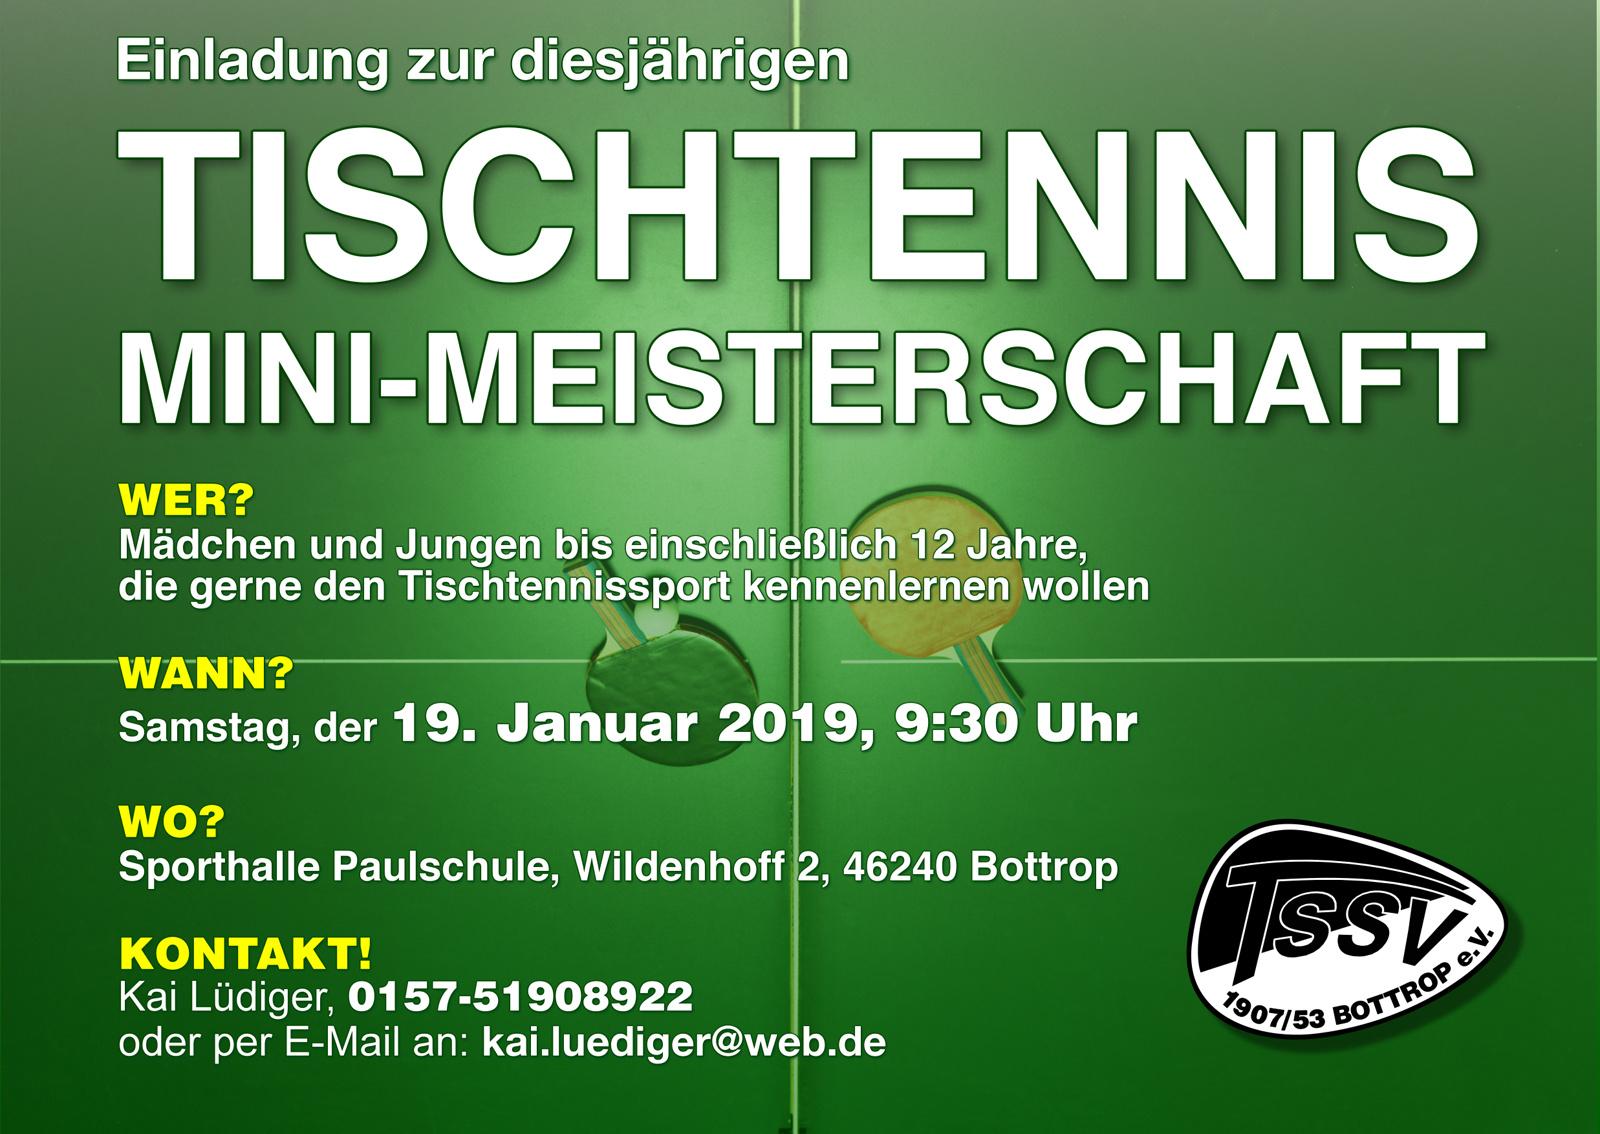 Tischtennis Mini-Meisterschaft 2019